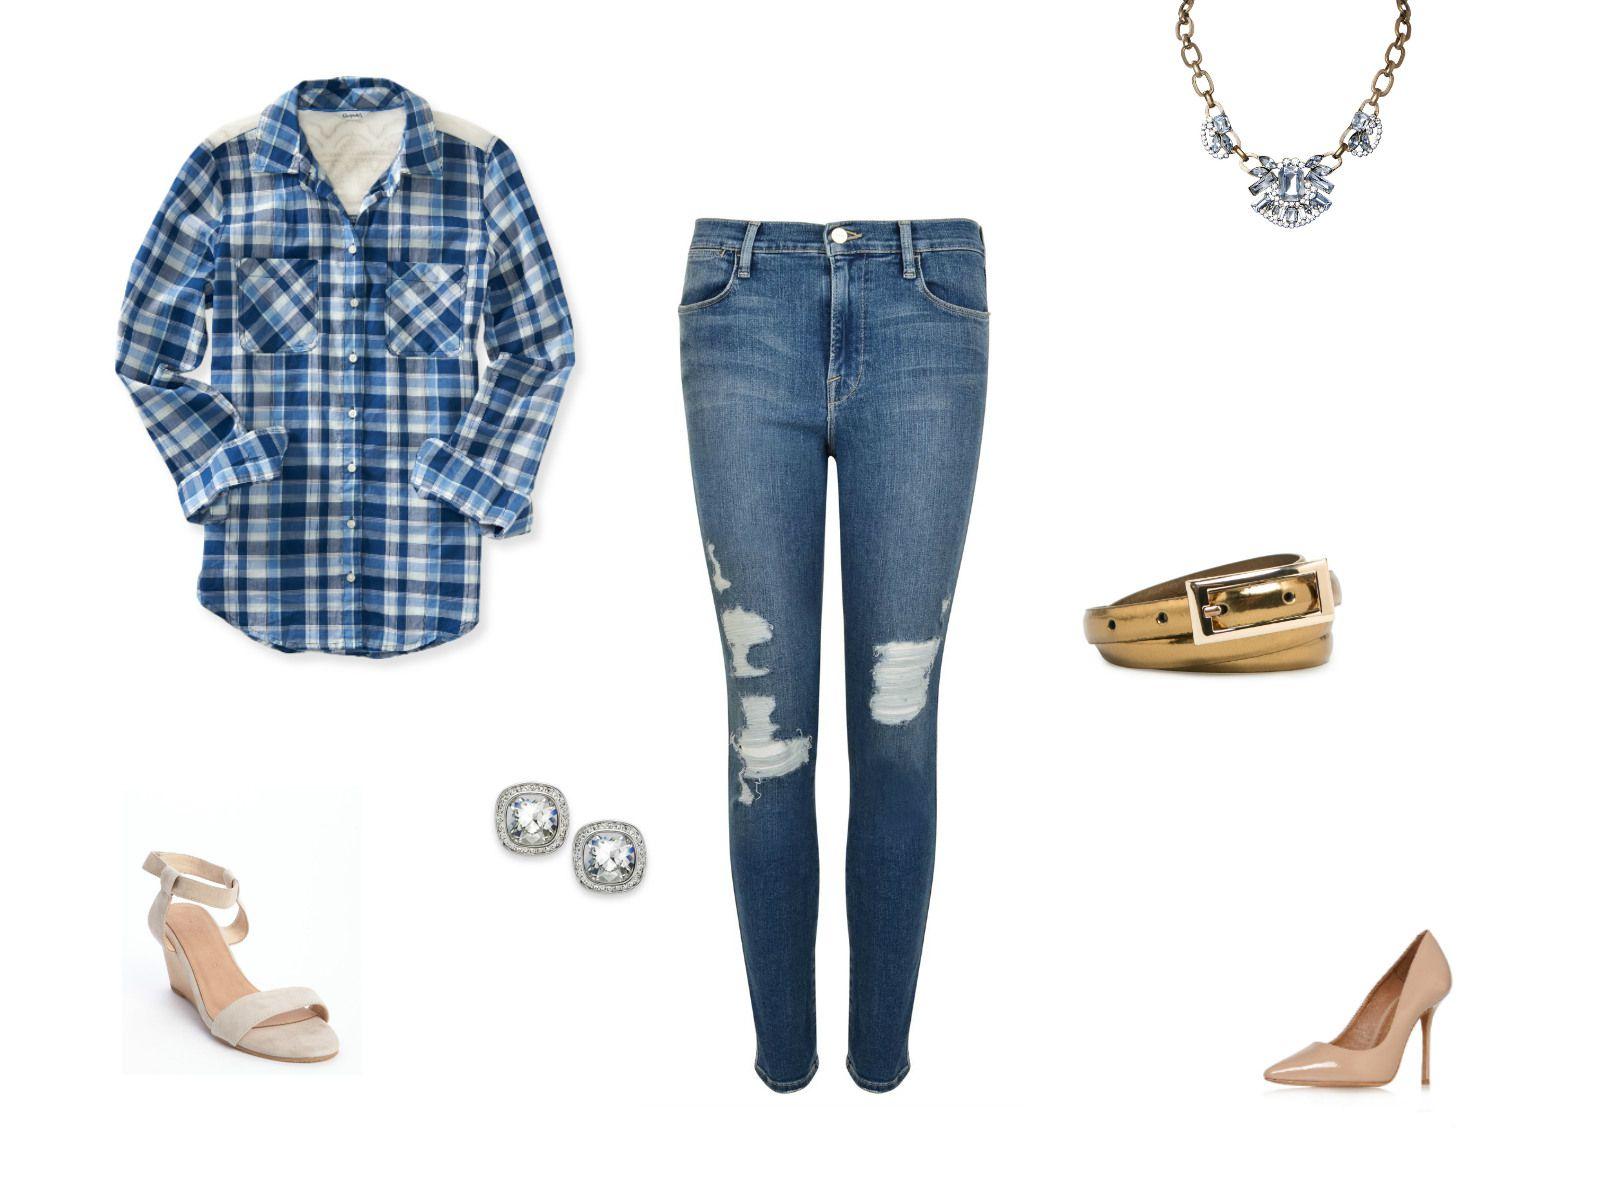 Skinny jeans and blue plaid shirt